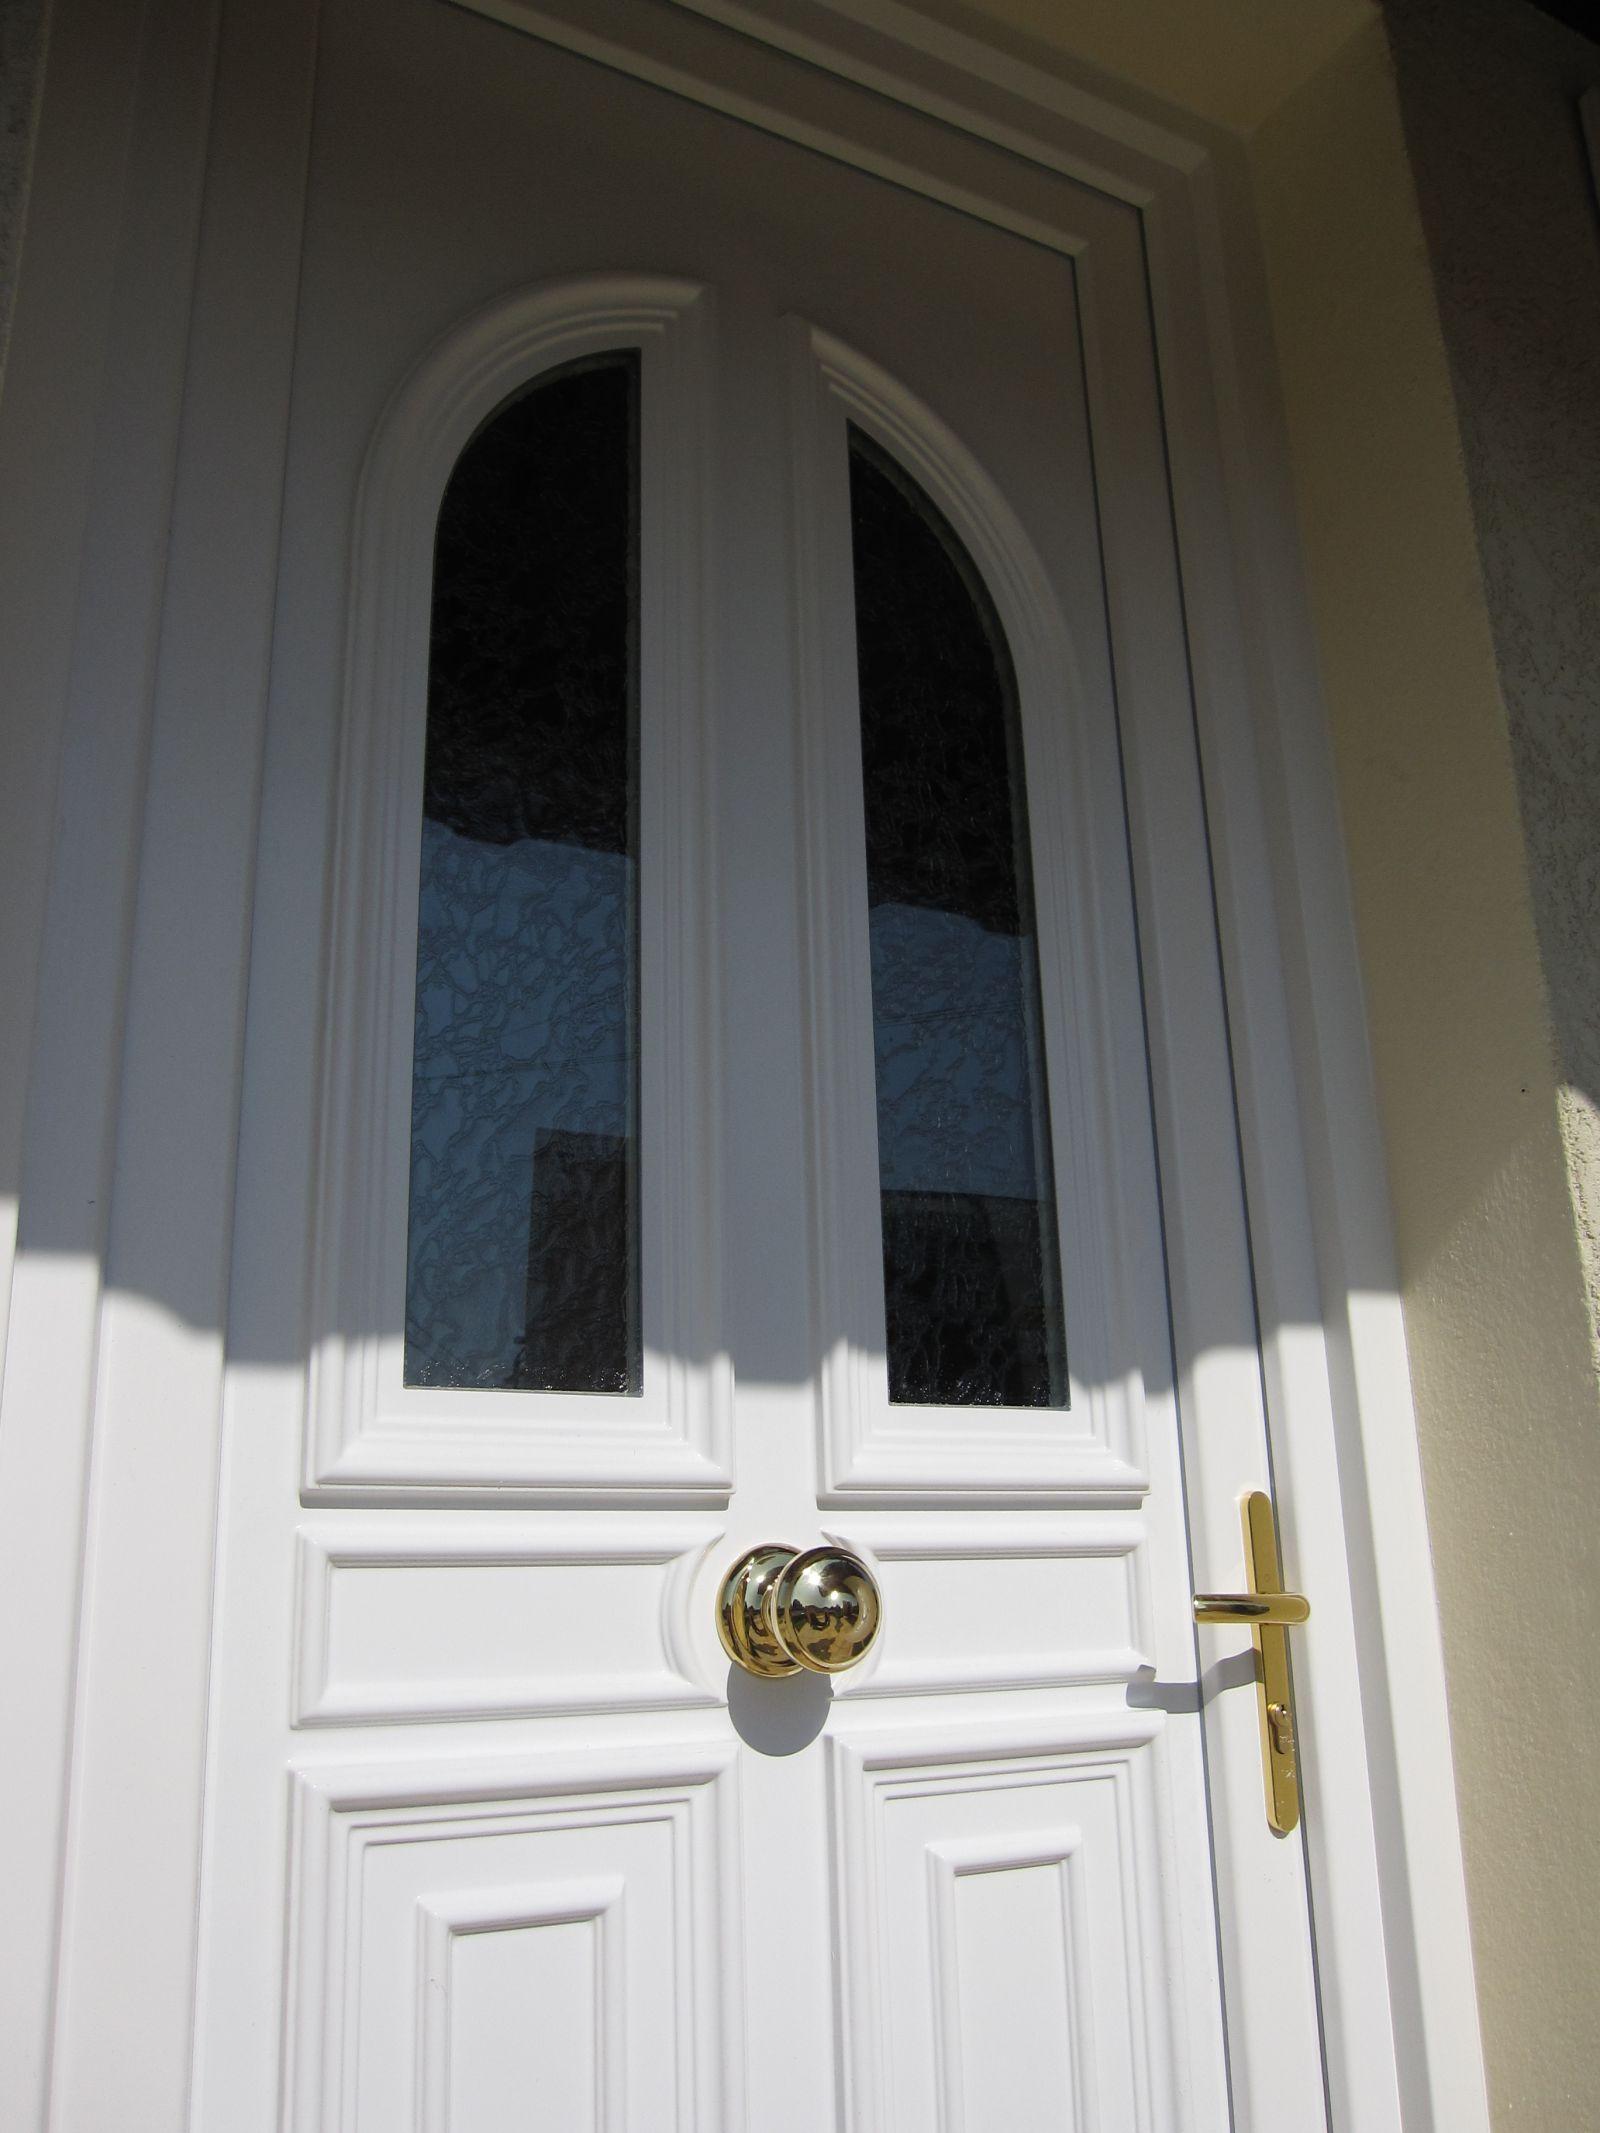 porte blind e chalon sur saone porte entr e le creusot porte blind e m con porte entr e saone et. Black Bedroom Furniture Sets. Home Design Ideas